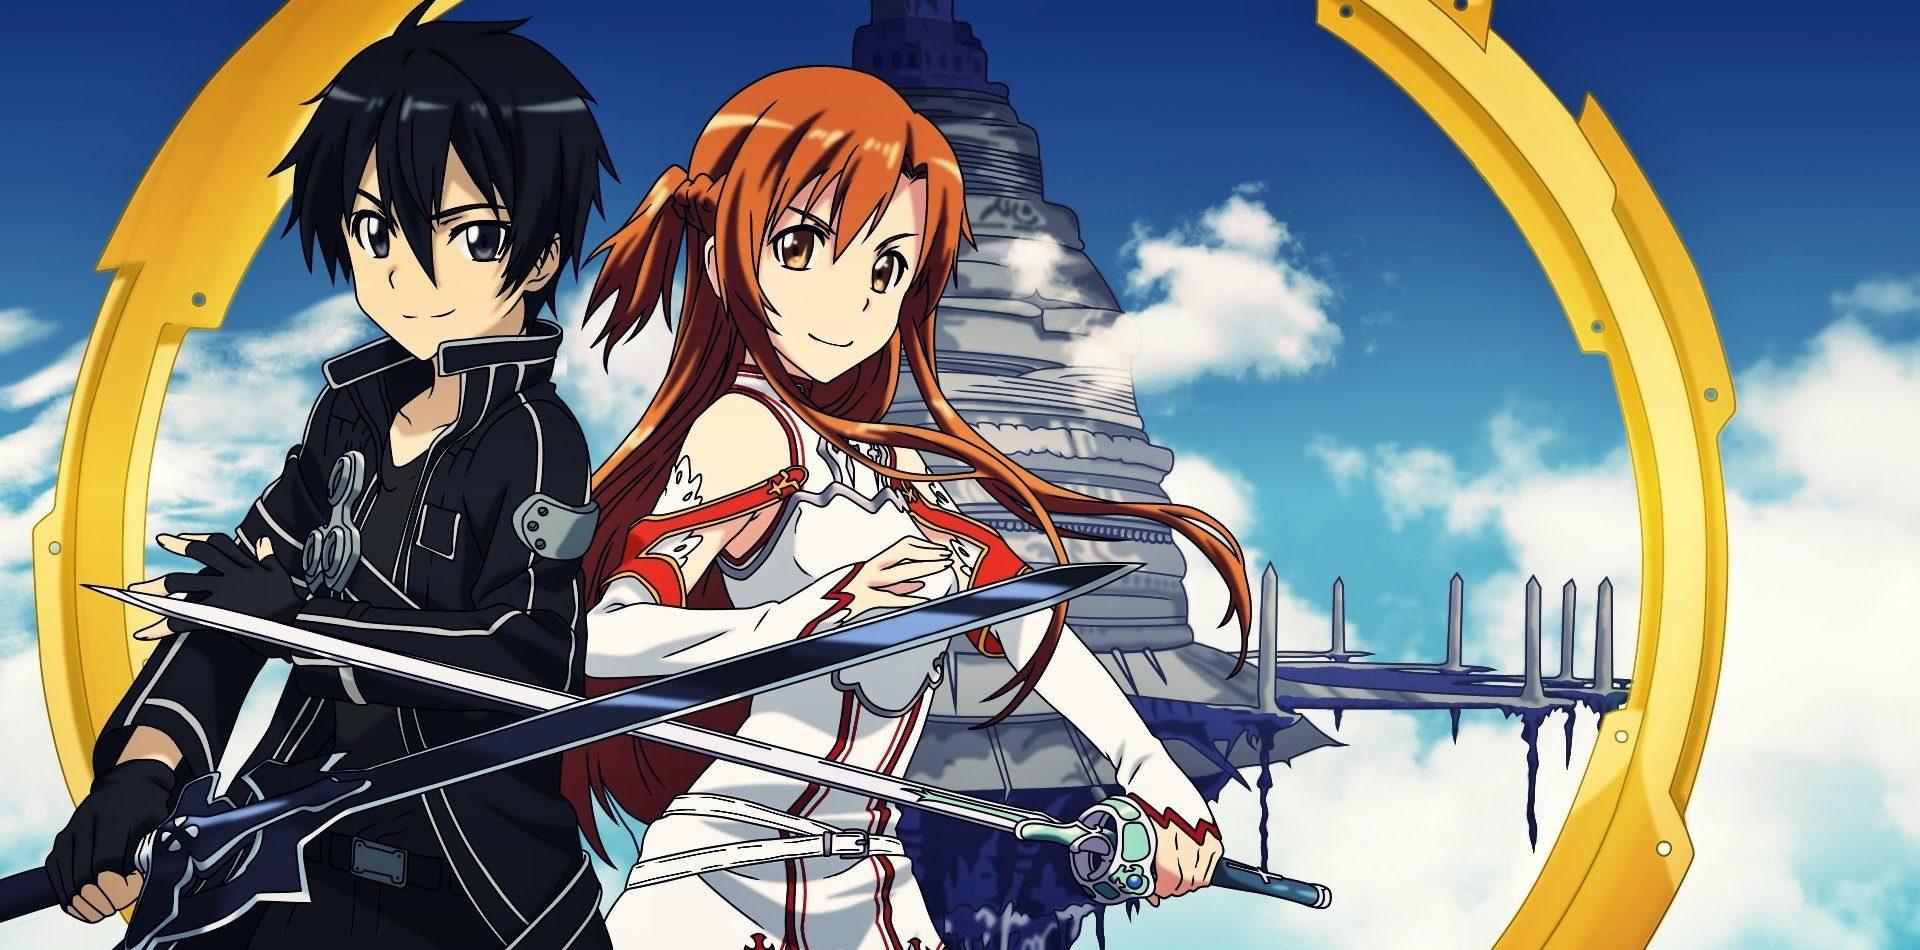 melhores animes - Sword Art Online